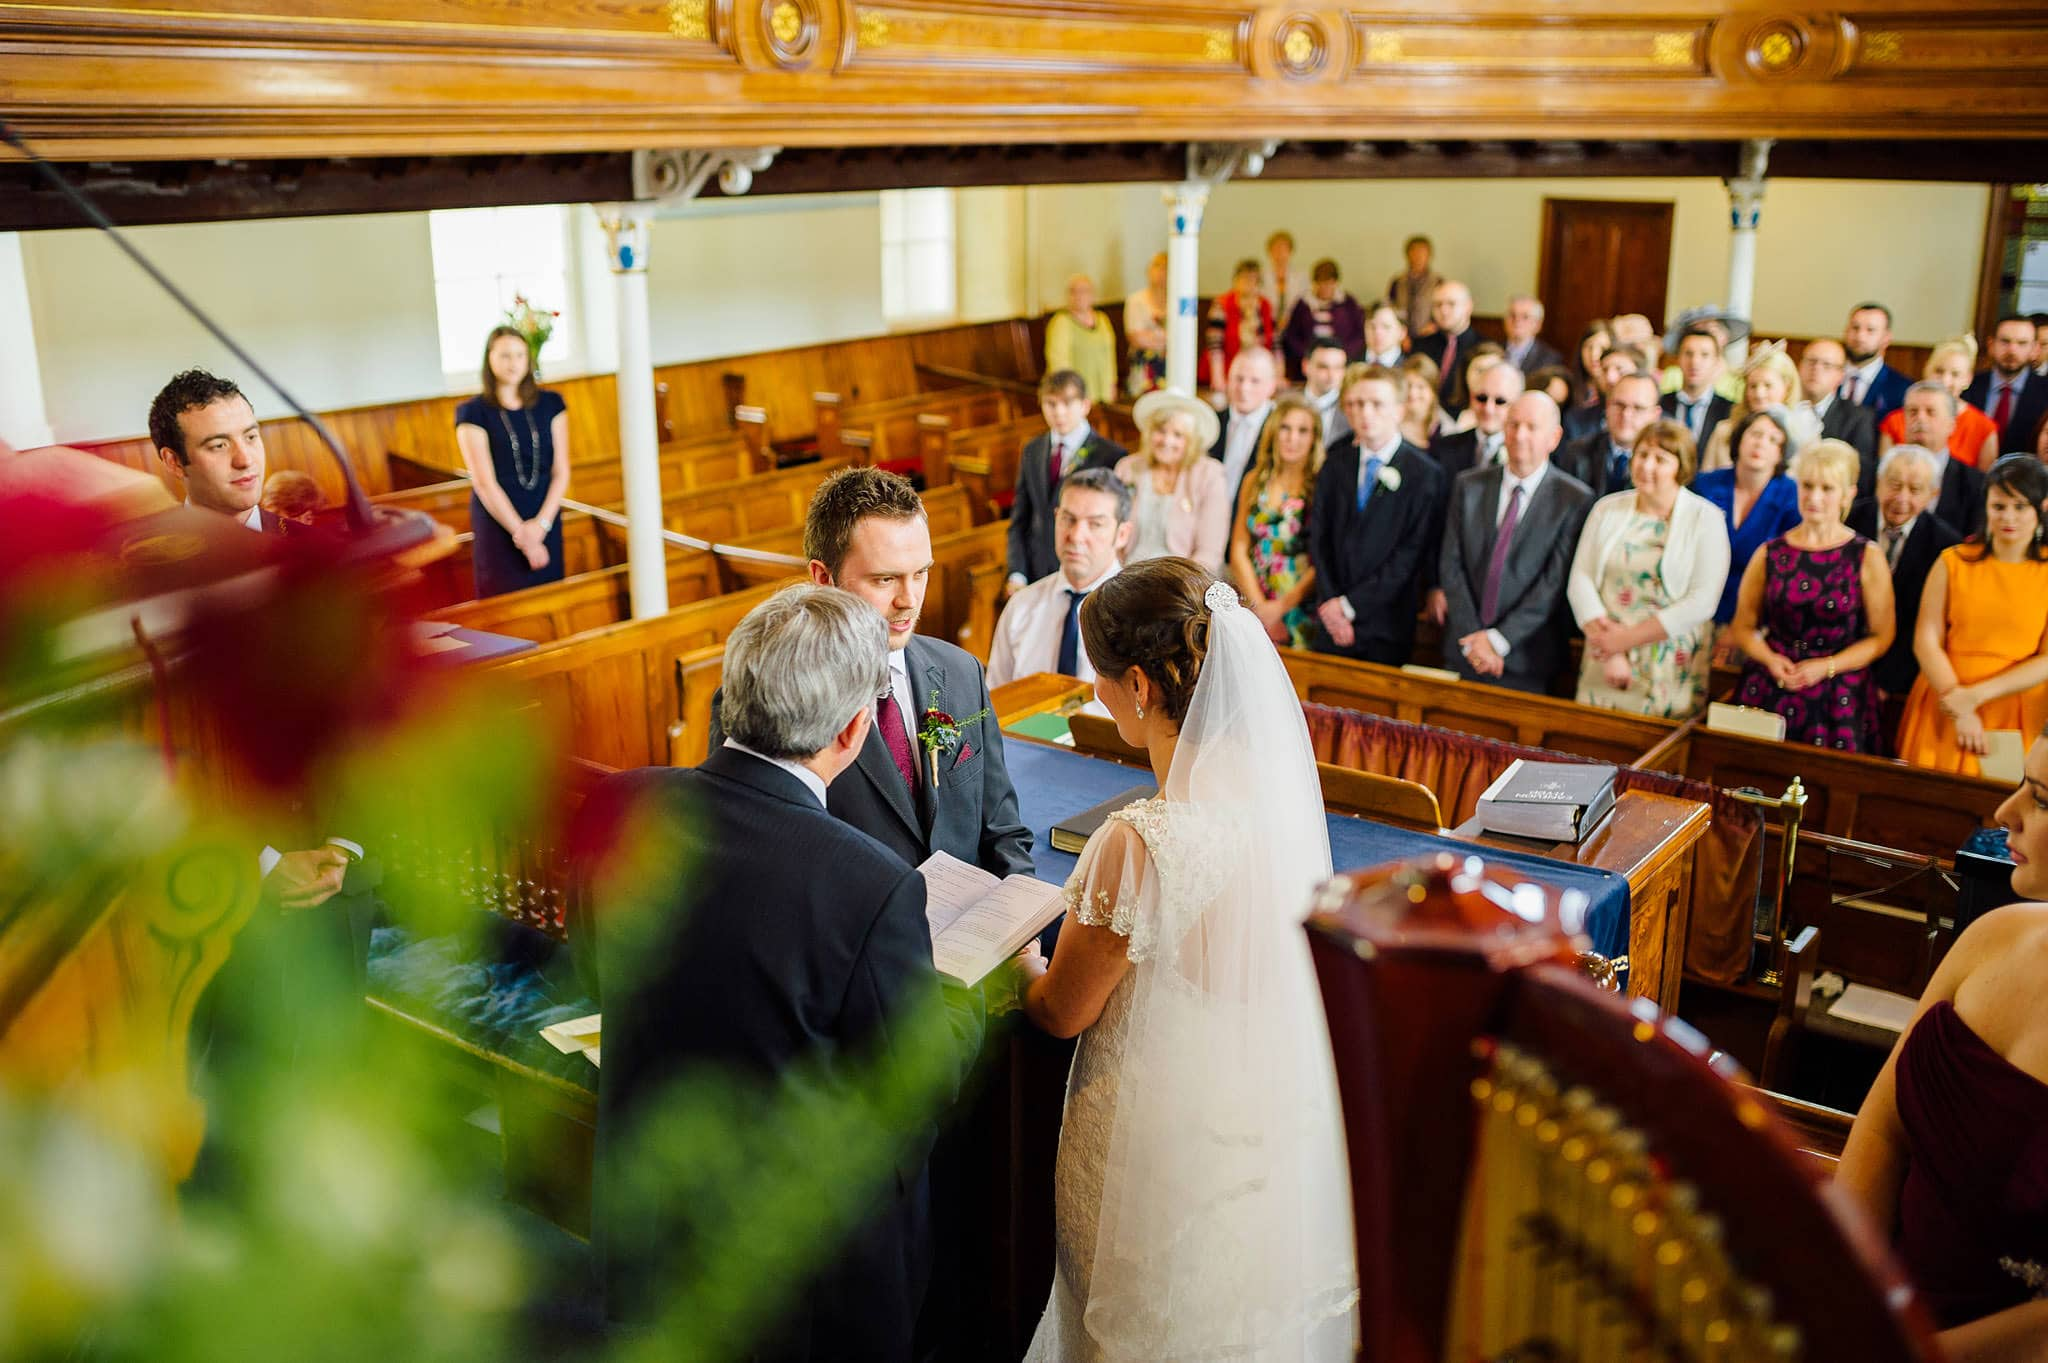 wedding-photographer-aberystwyth-wales (42)